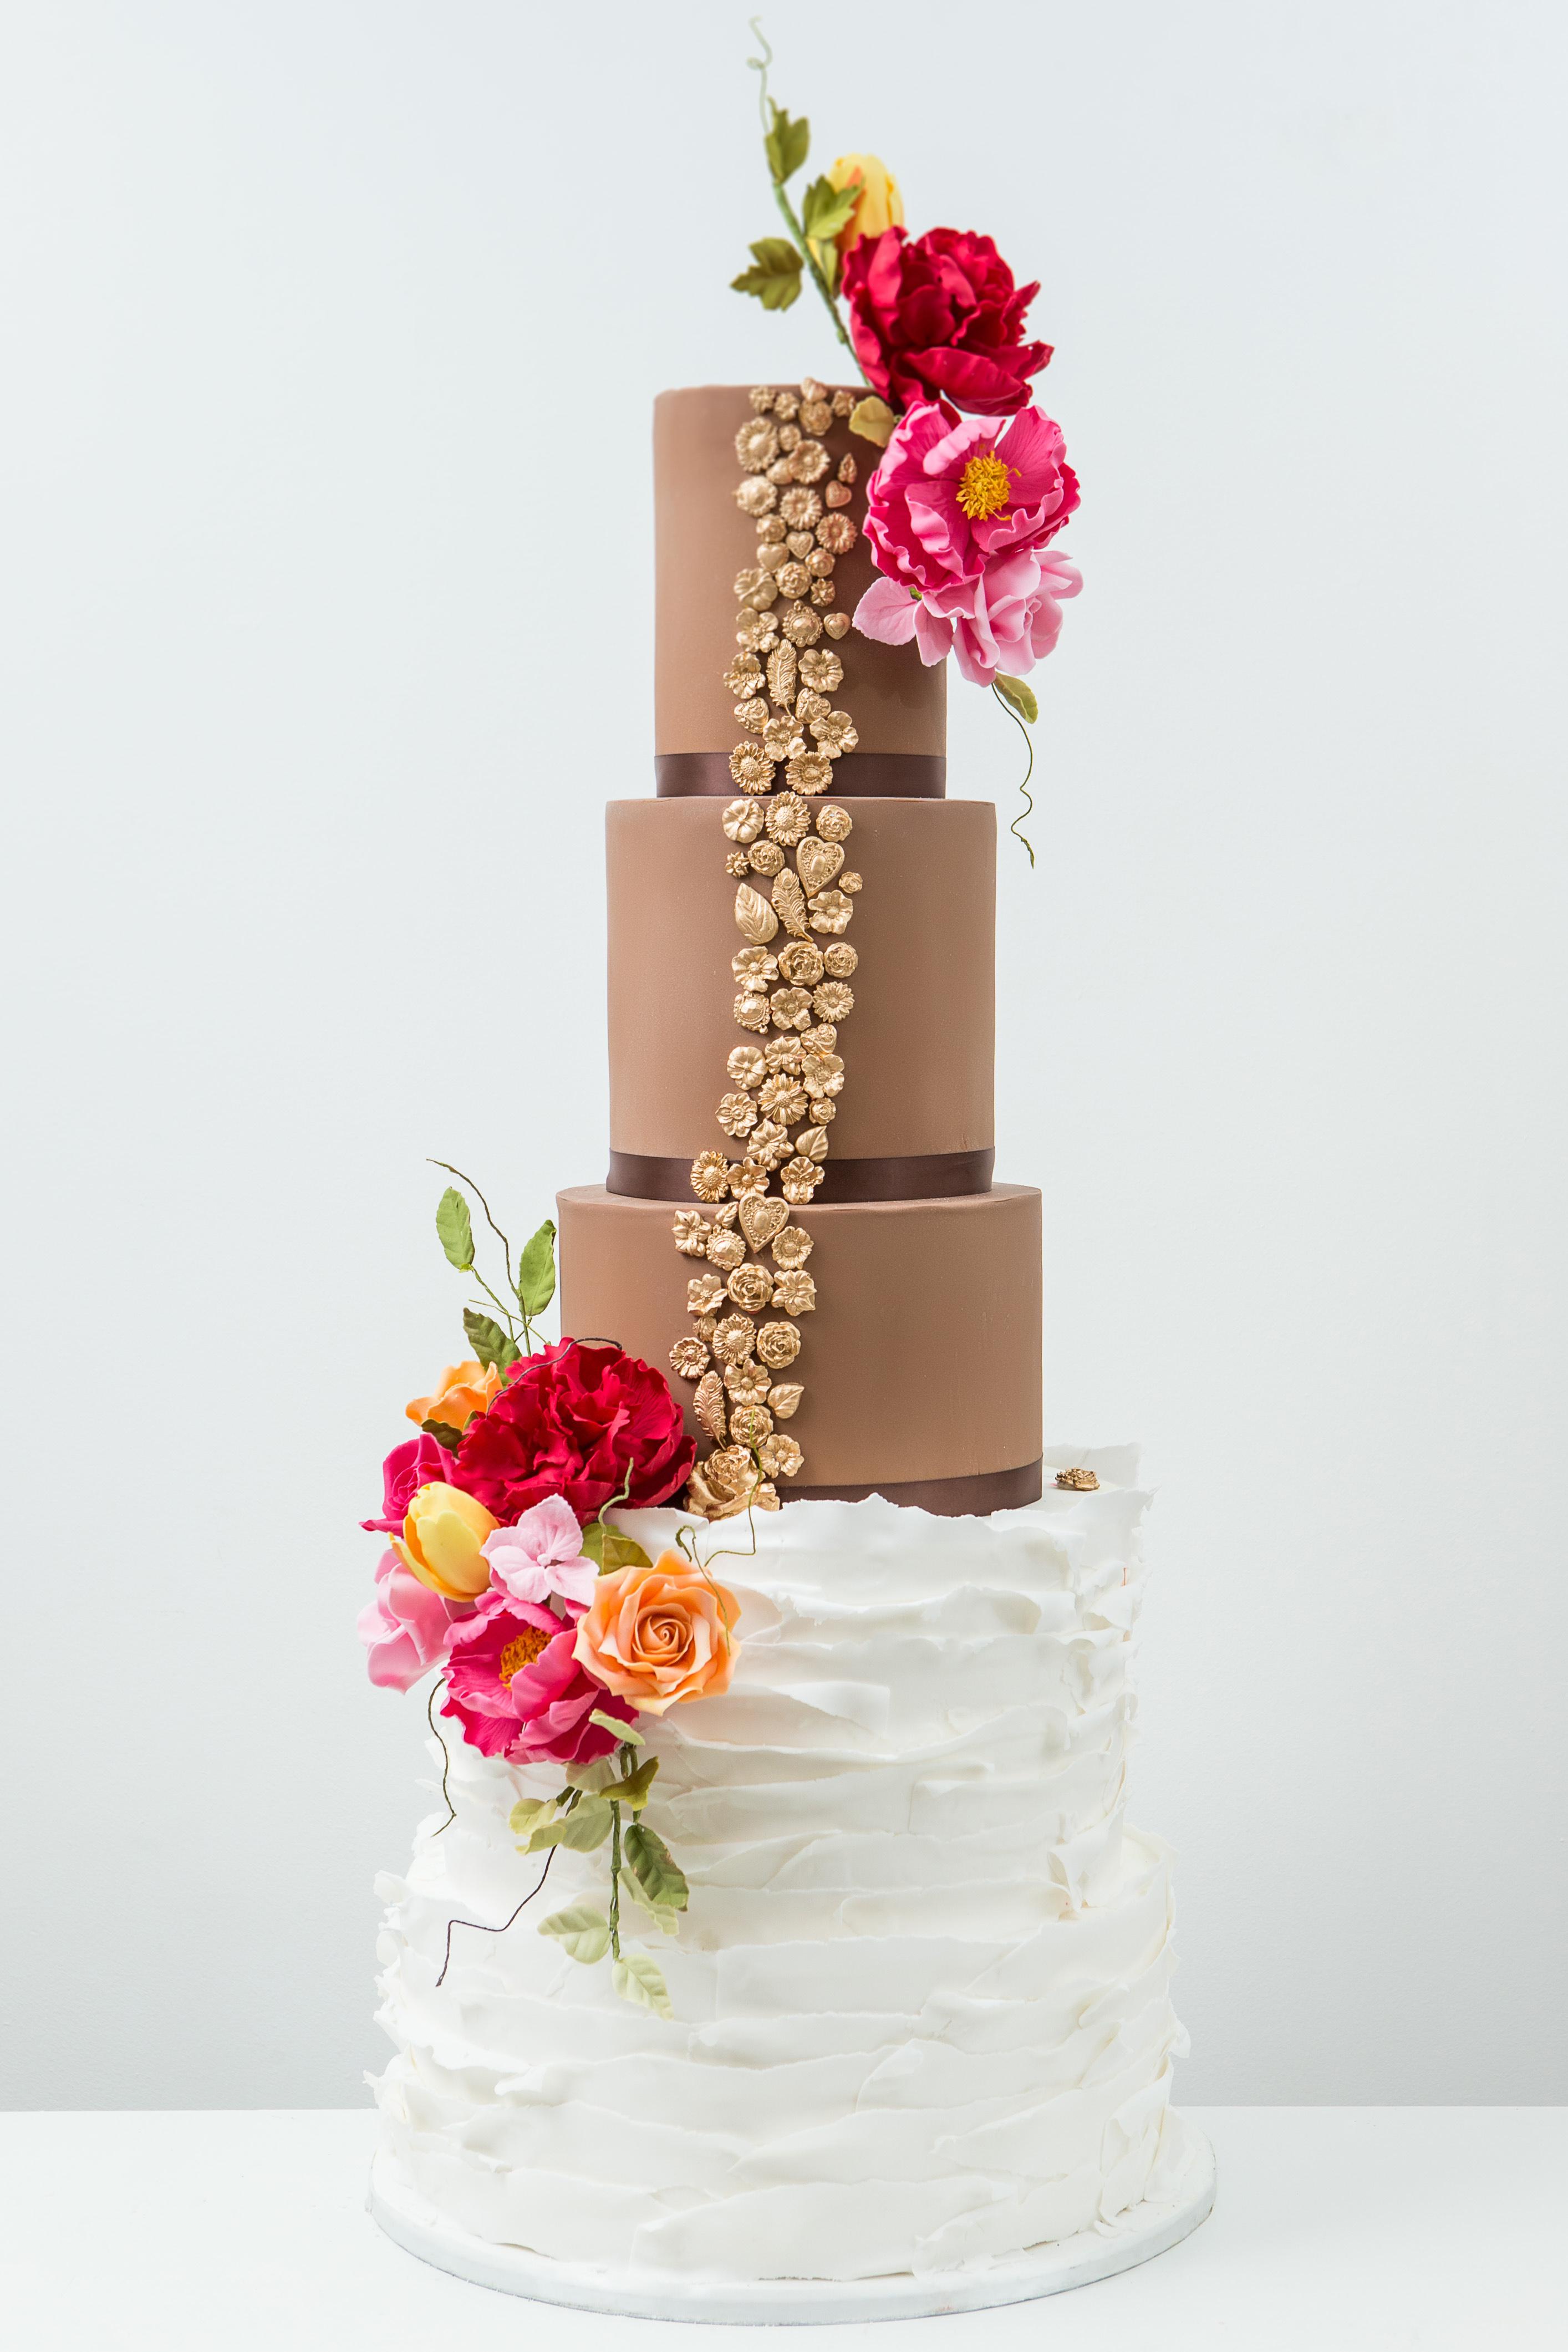 textured-cake-chocolate-ruffle-cake-elizabethscakeemporium-1